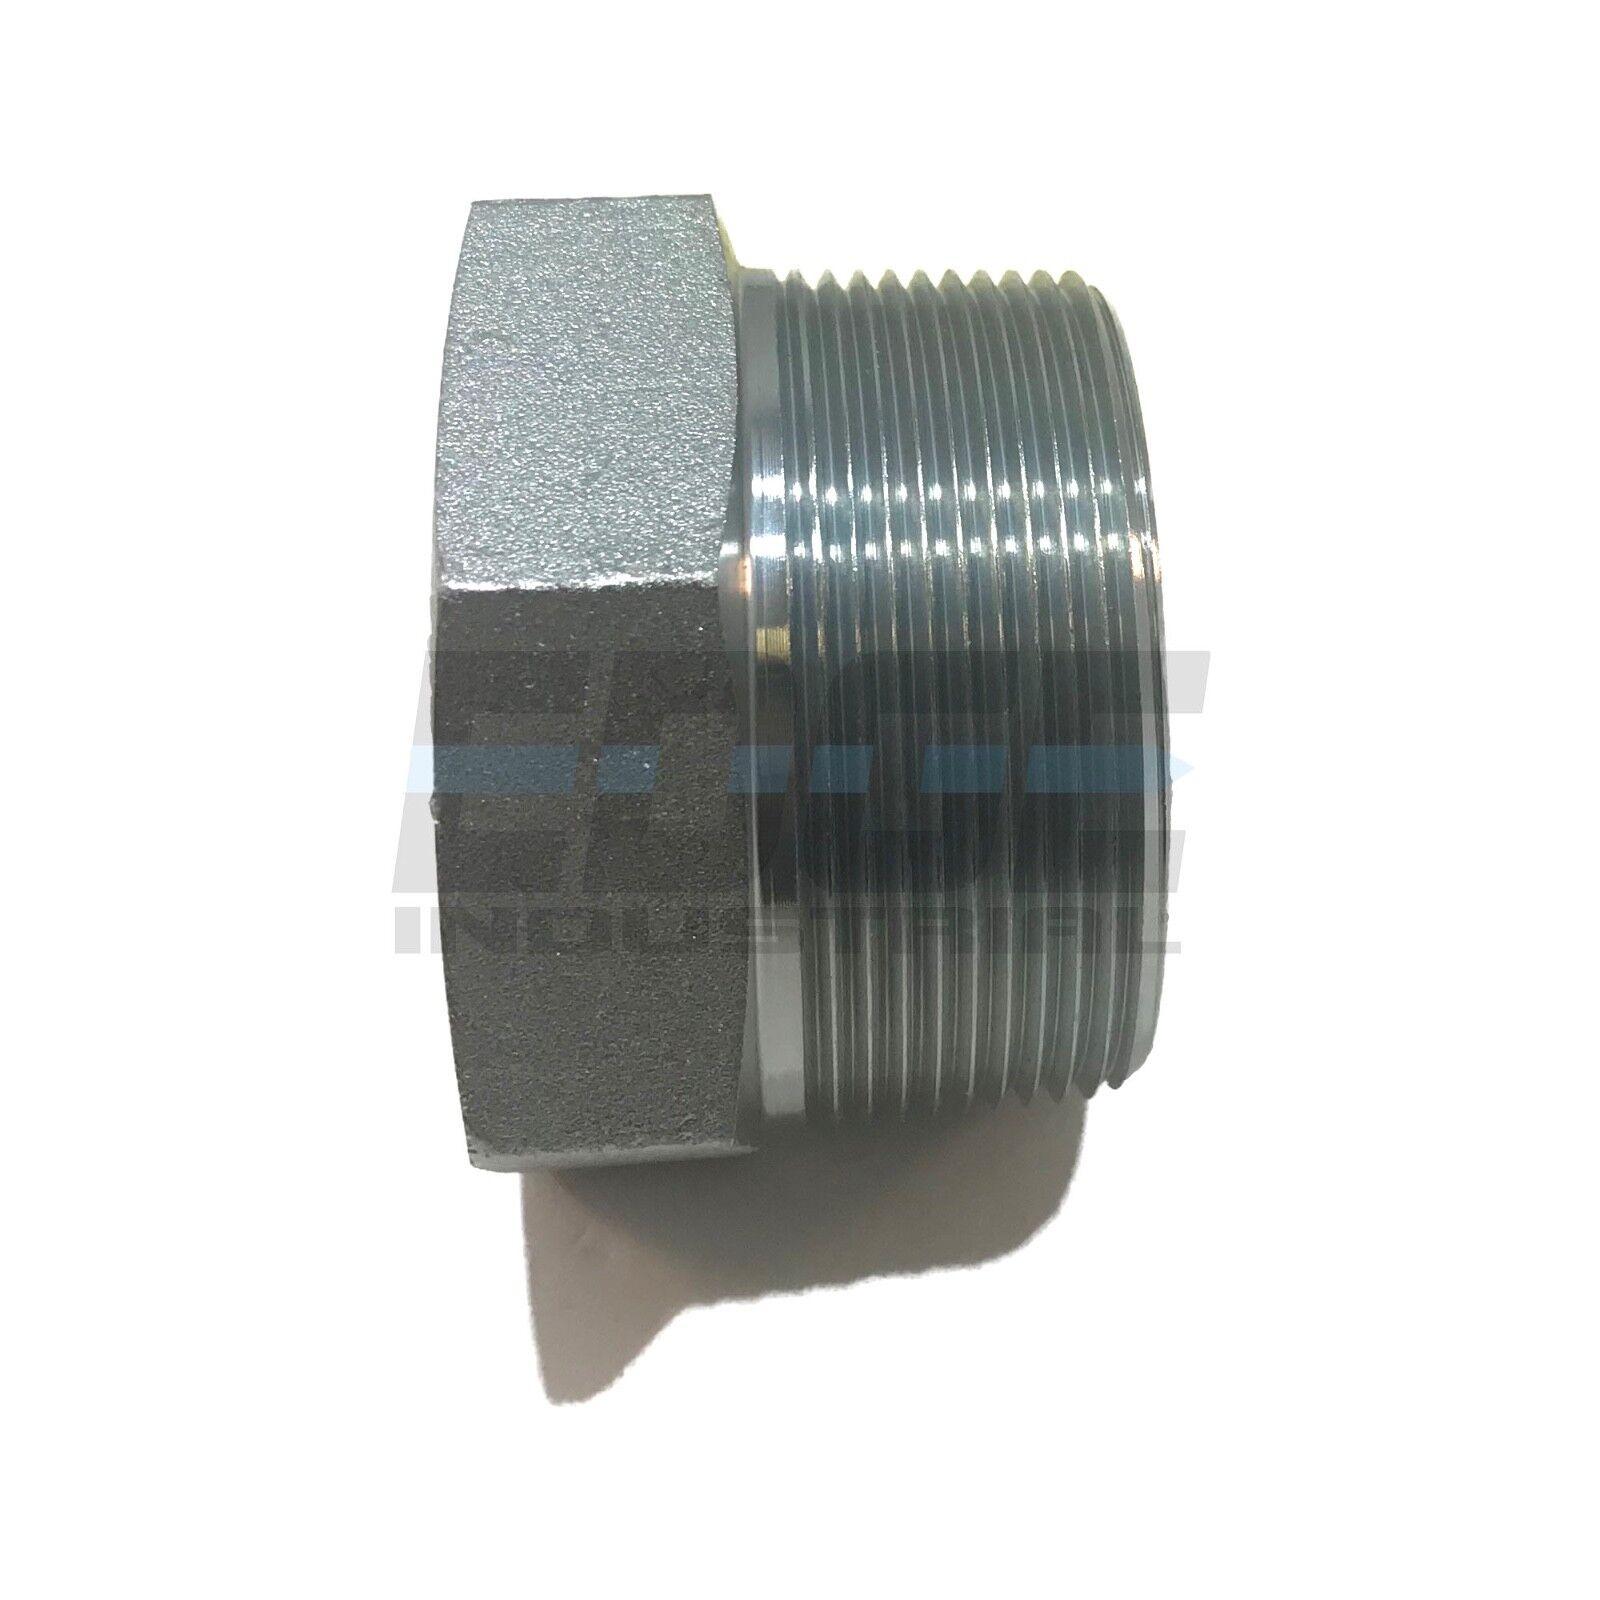 STEEL REDUCING HEX BUSHING 2  MNPT x 1-1 2  FNPT HYDRUALIC FUEL AIR WOG